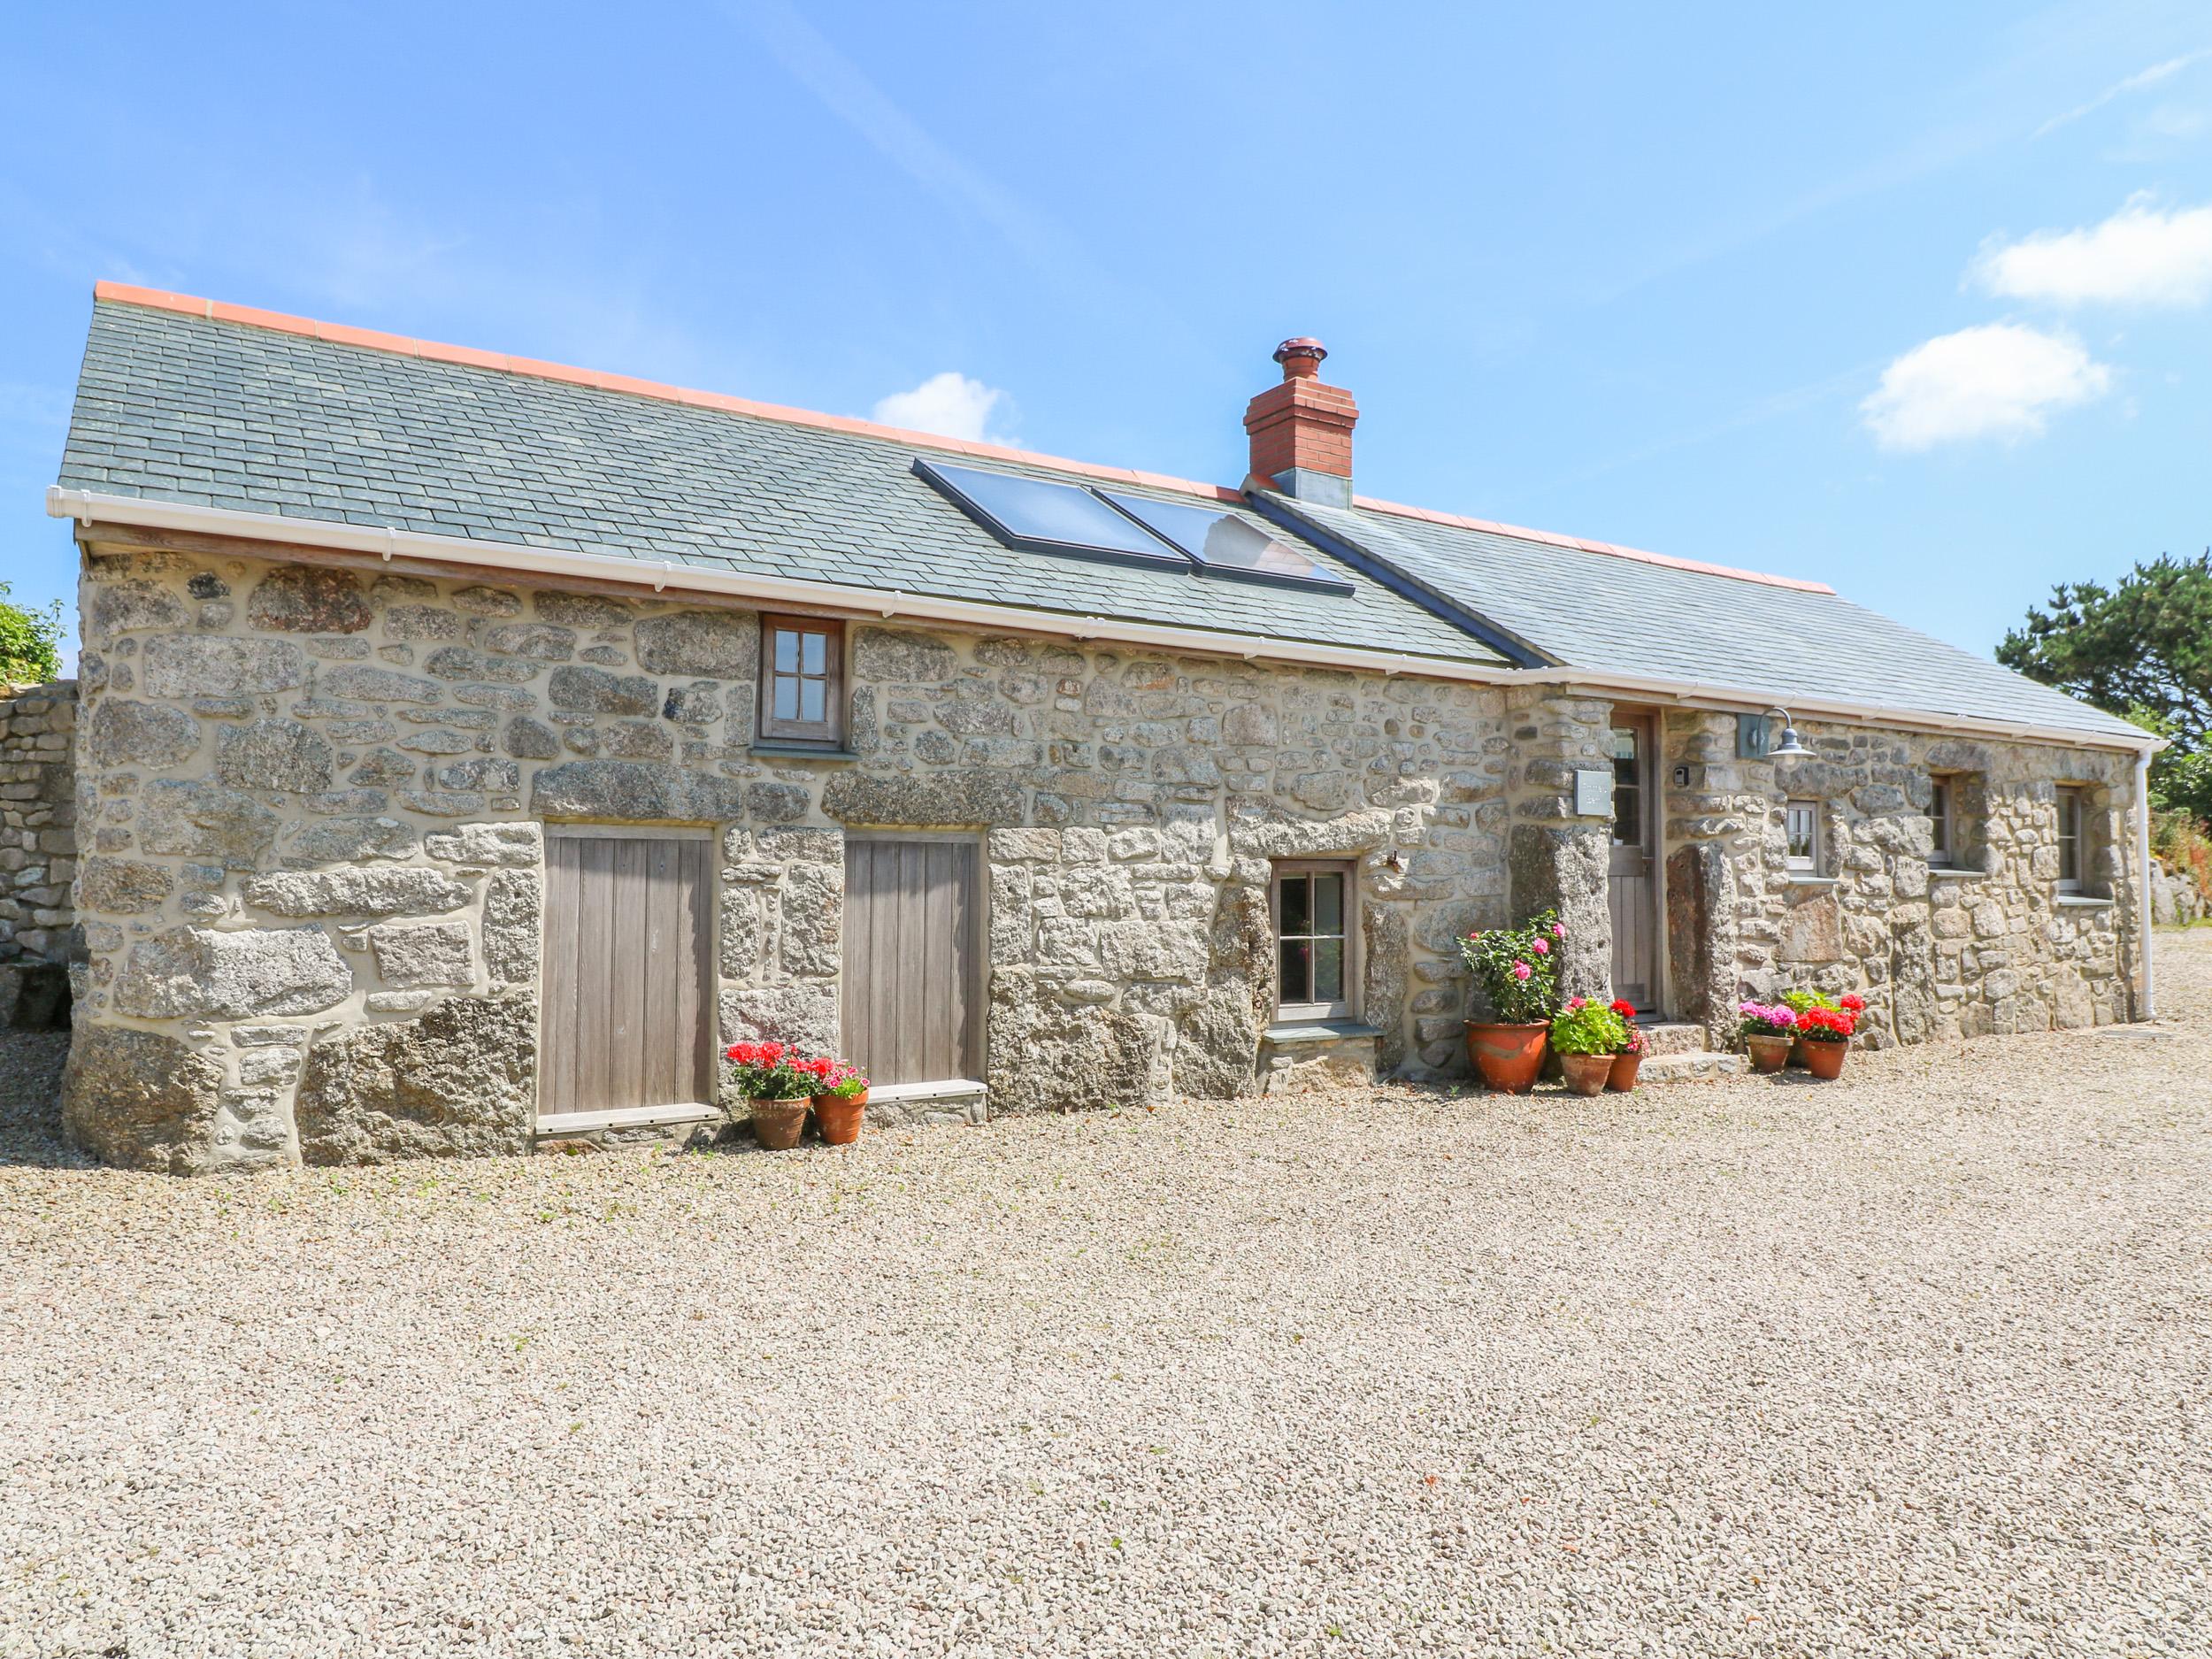 Emma's Barn, St Just, Cornwall